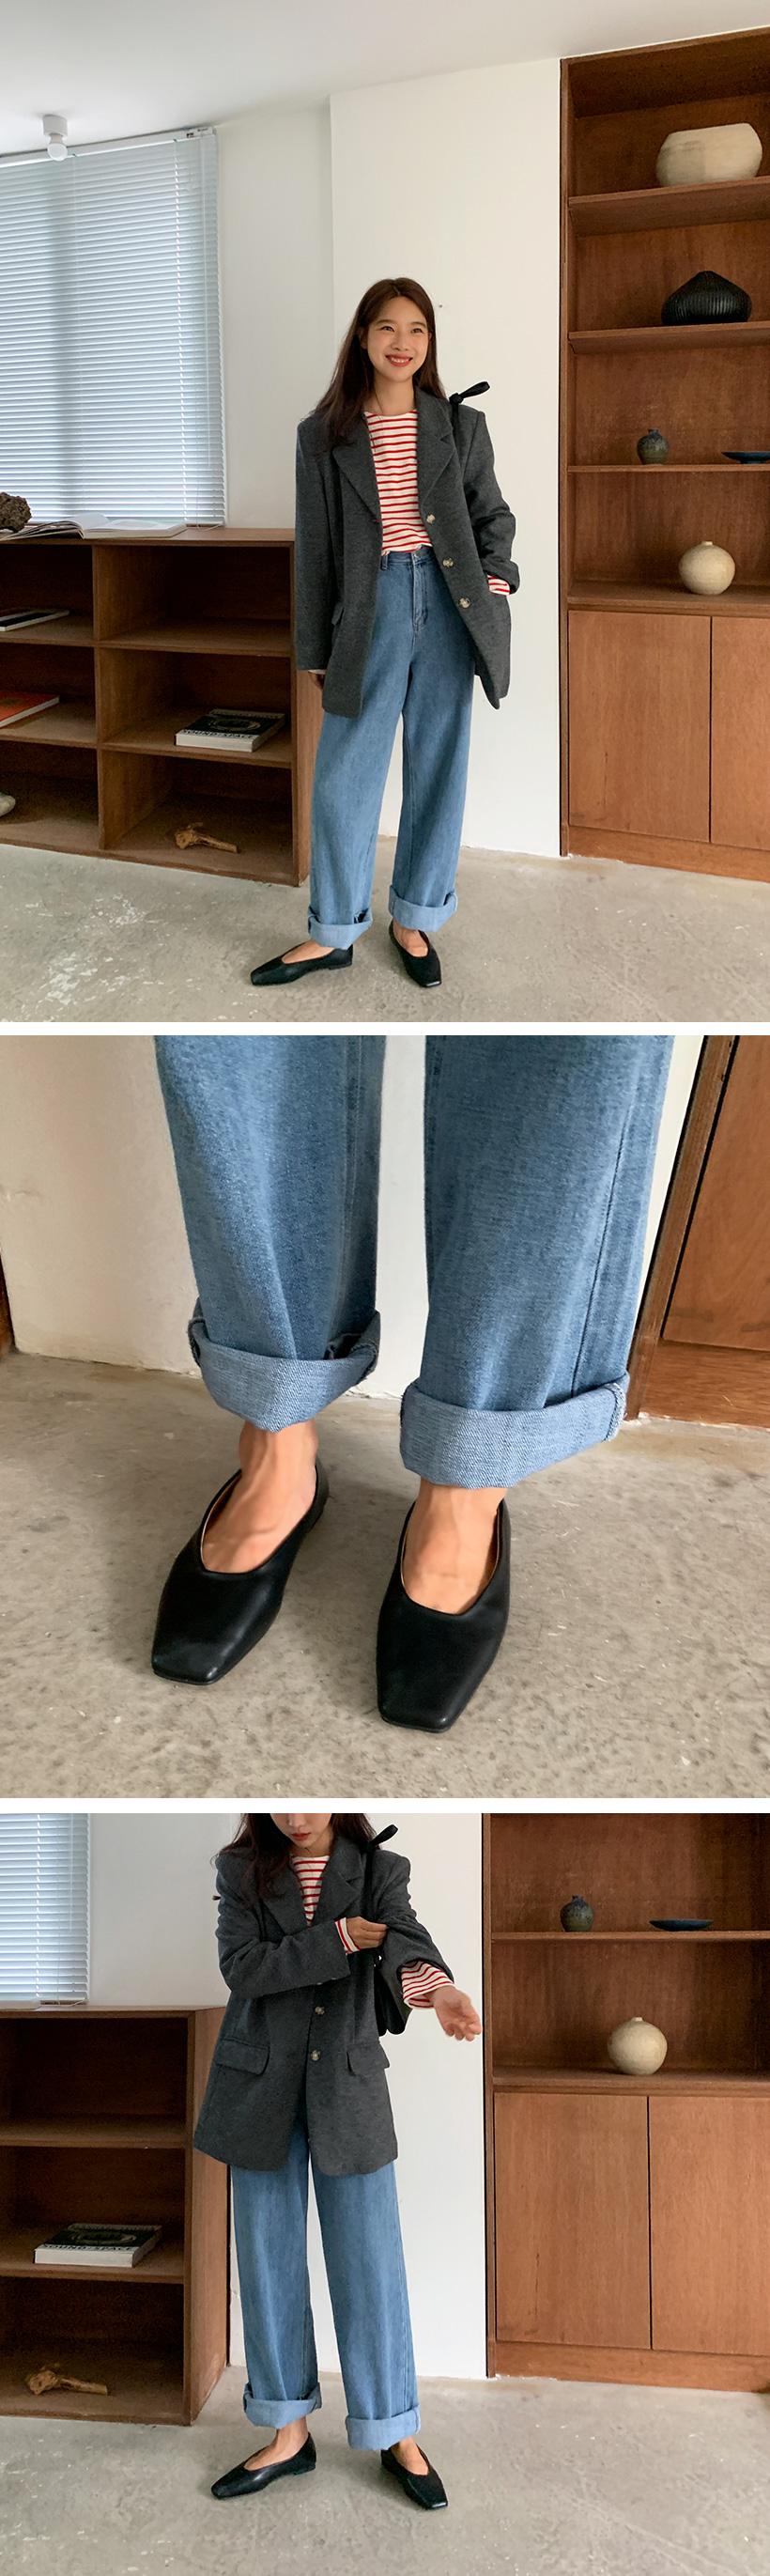 Square toe flat shoes_C (size : 225,230,235,240,245,250)